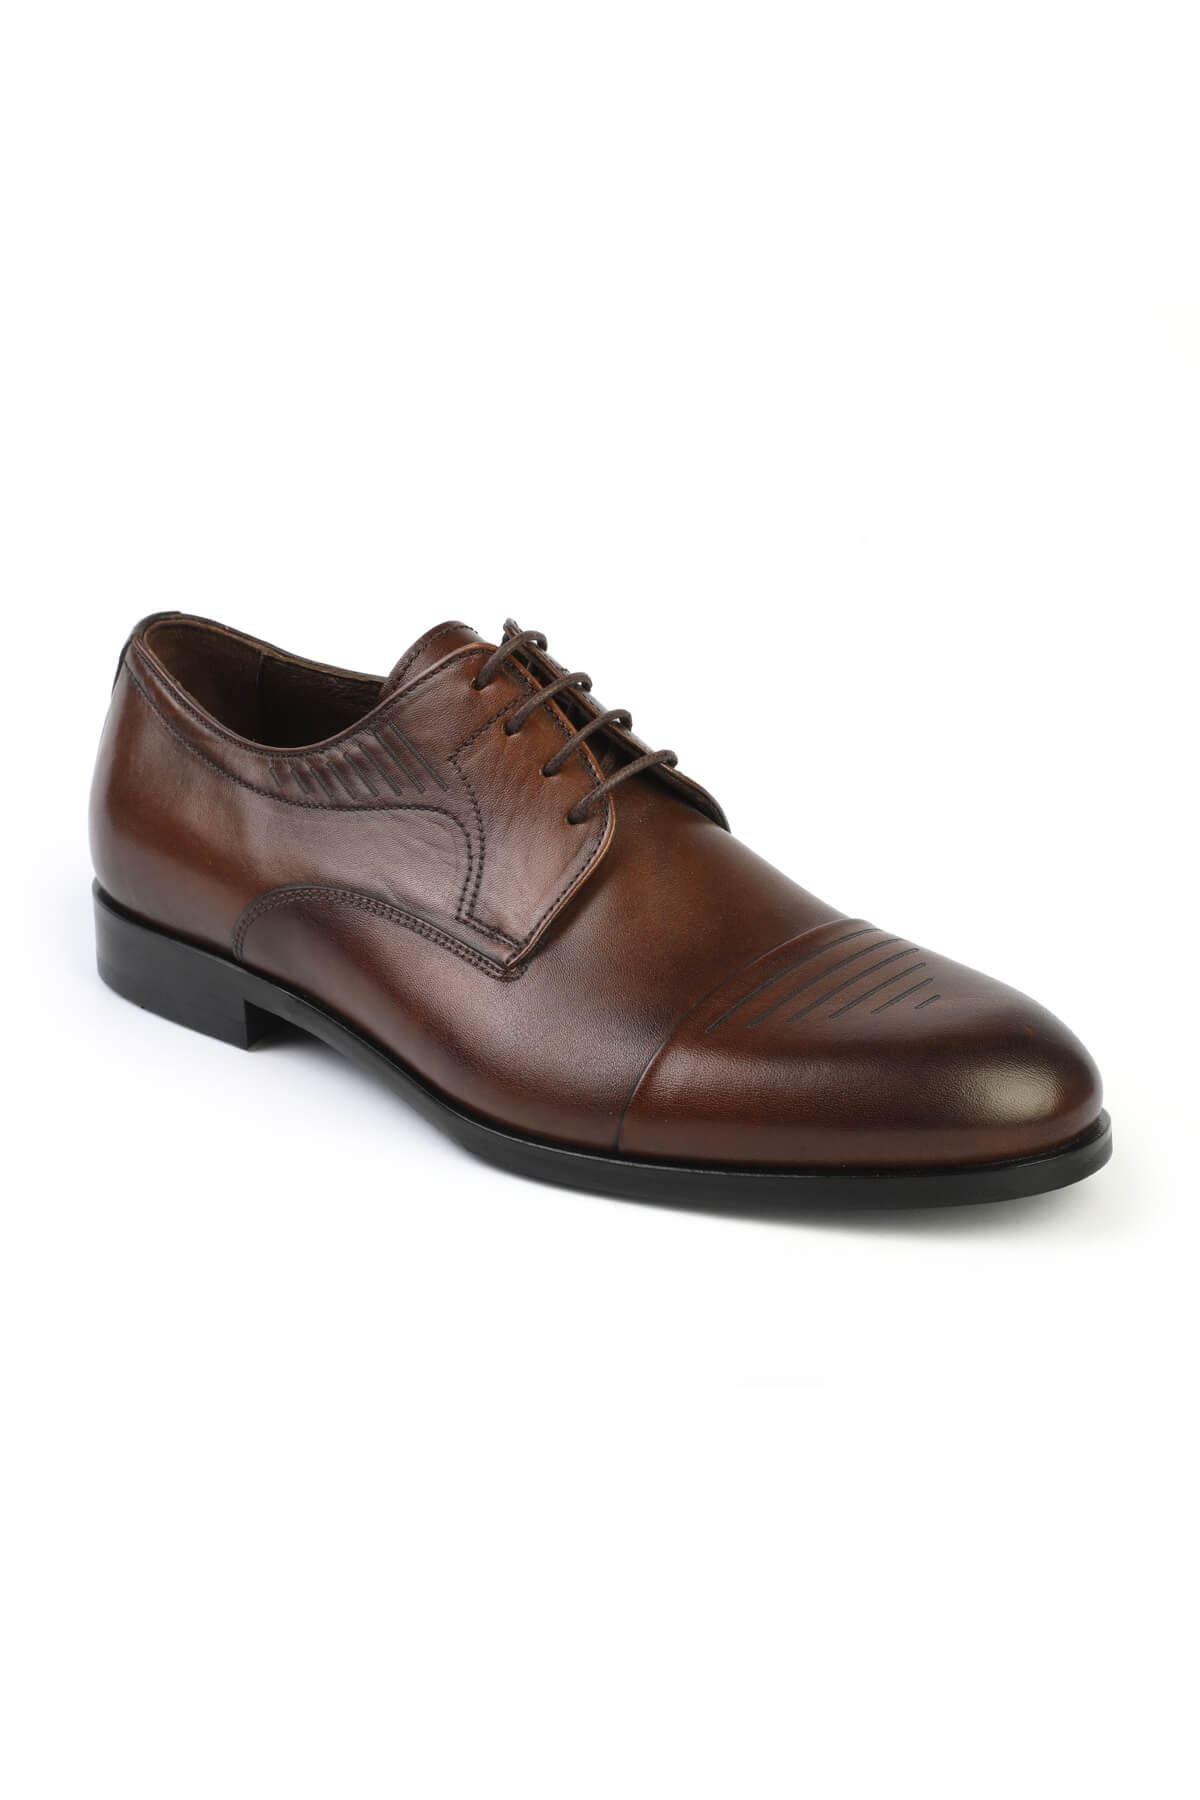 Libero 2776 Brown Classic Shoes